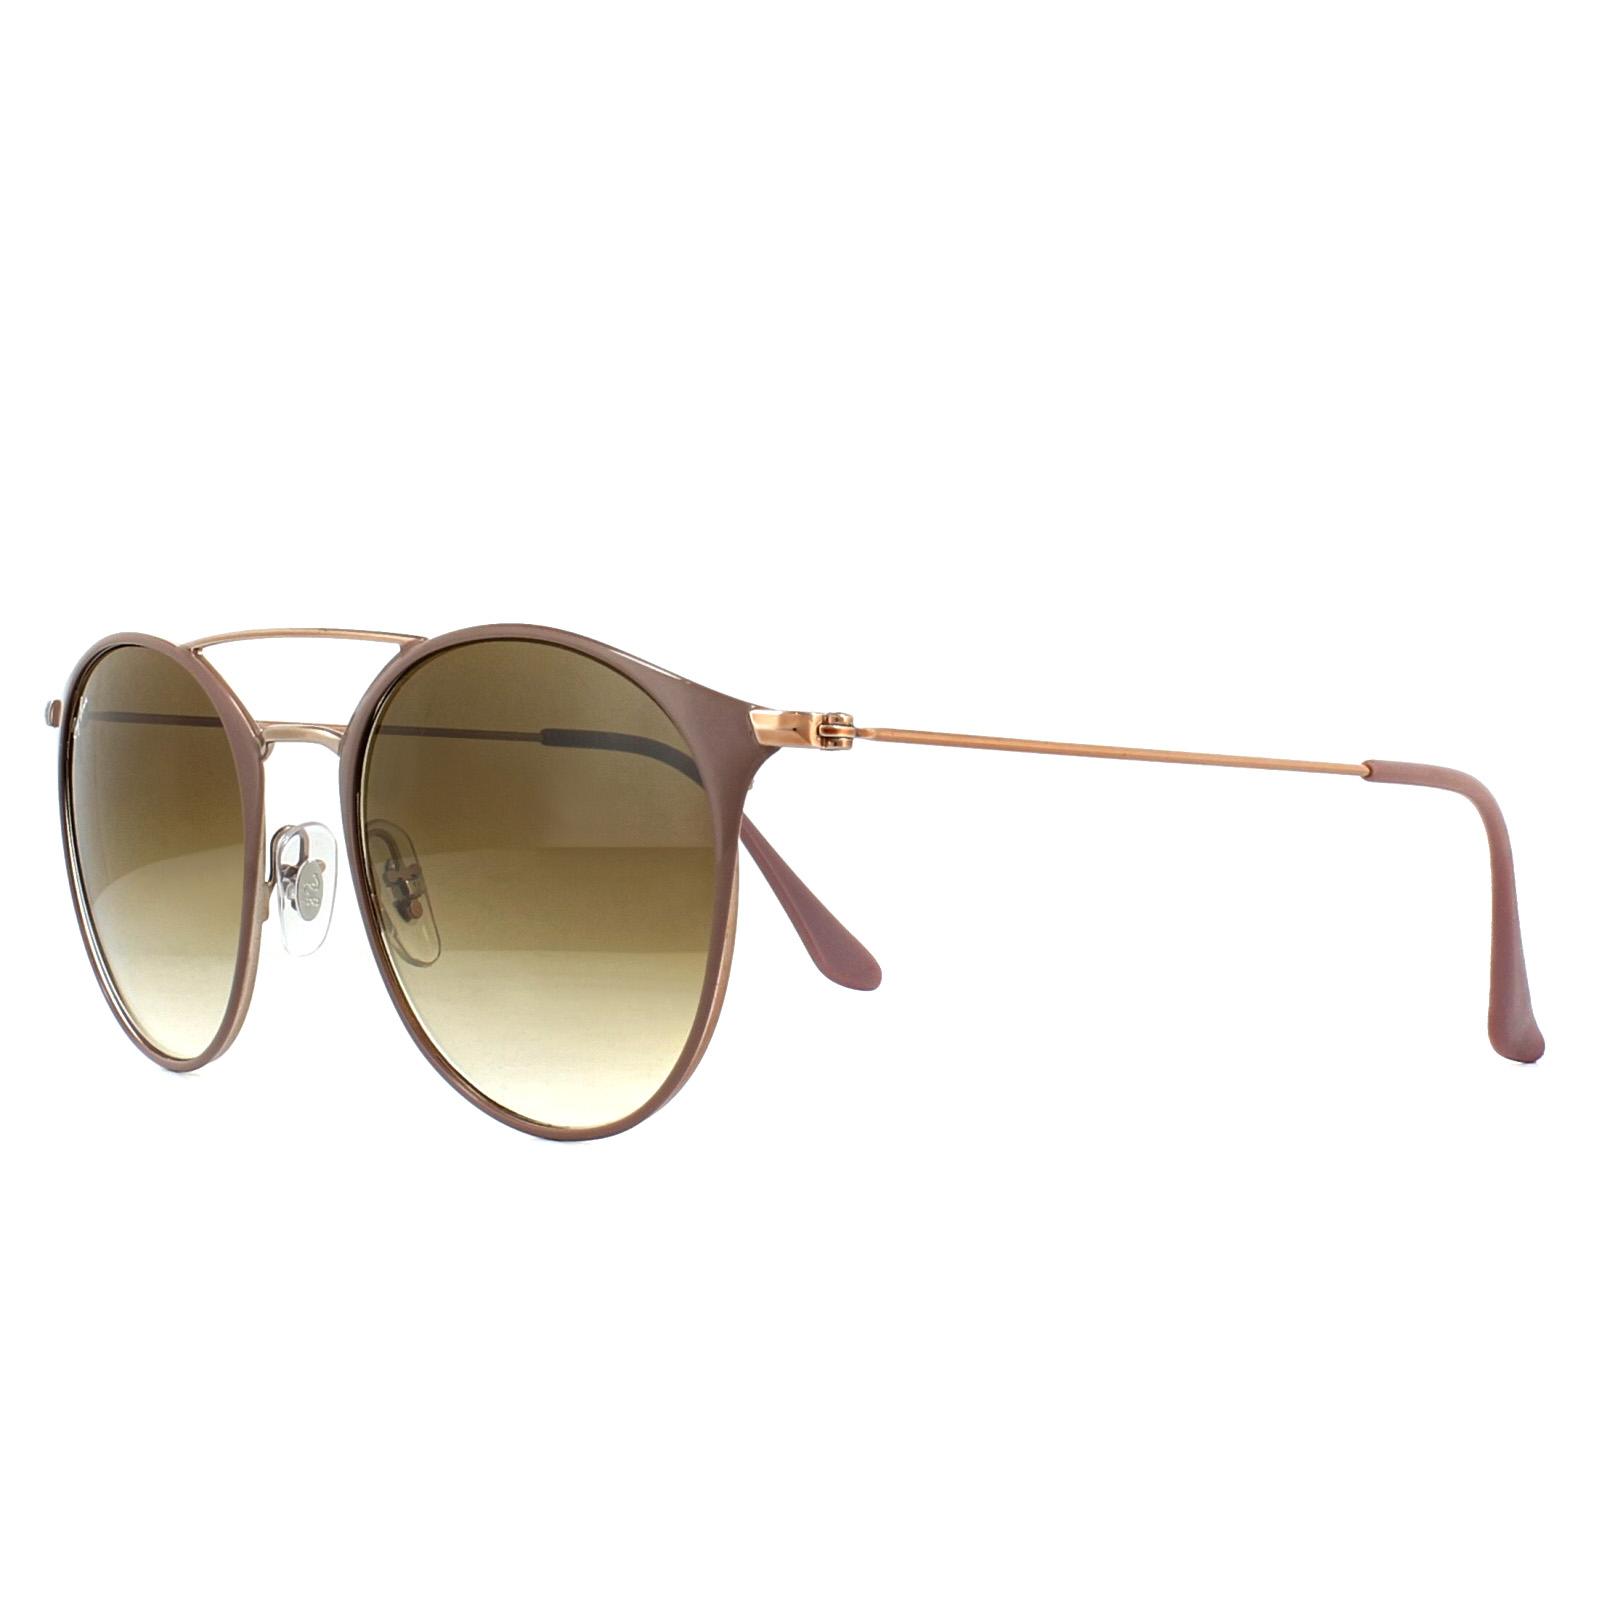 2aa26c63cd5c6 Sentinel Ray-Ban Sunglasses 3546 907151 Brown Bronze Copper Light Brown  Gradient 52mm